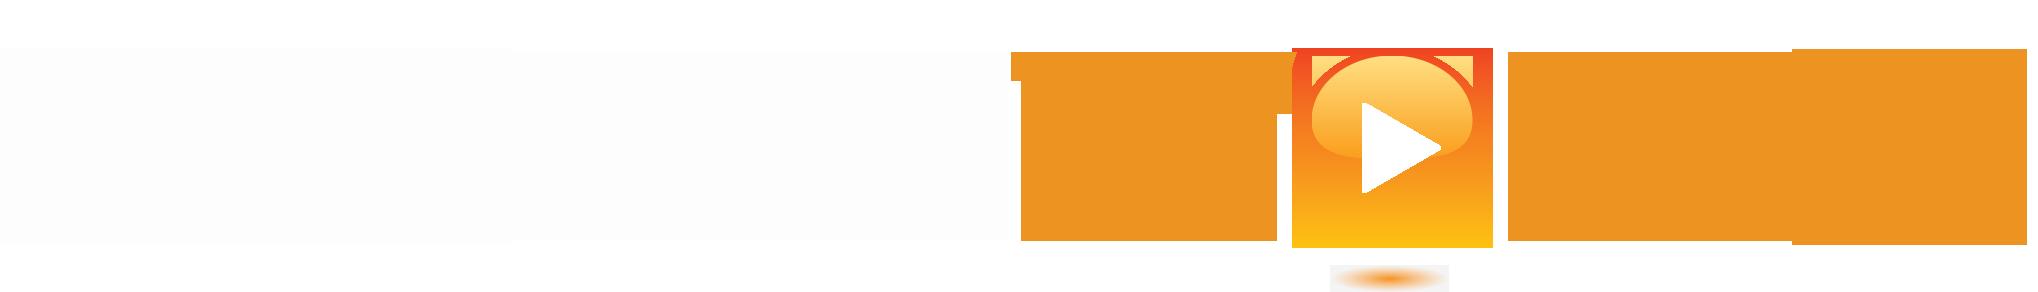 2017_SW_newlogo_final reverse